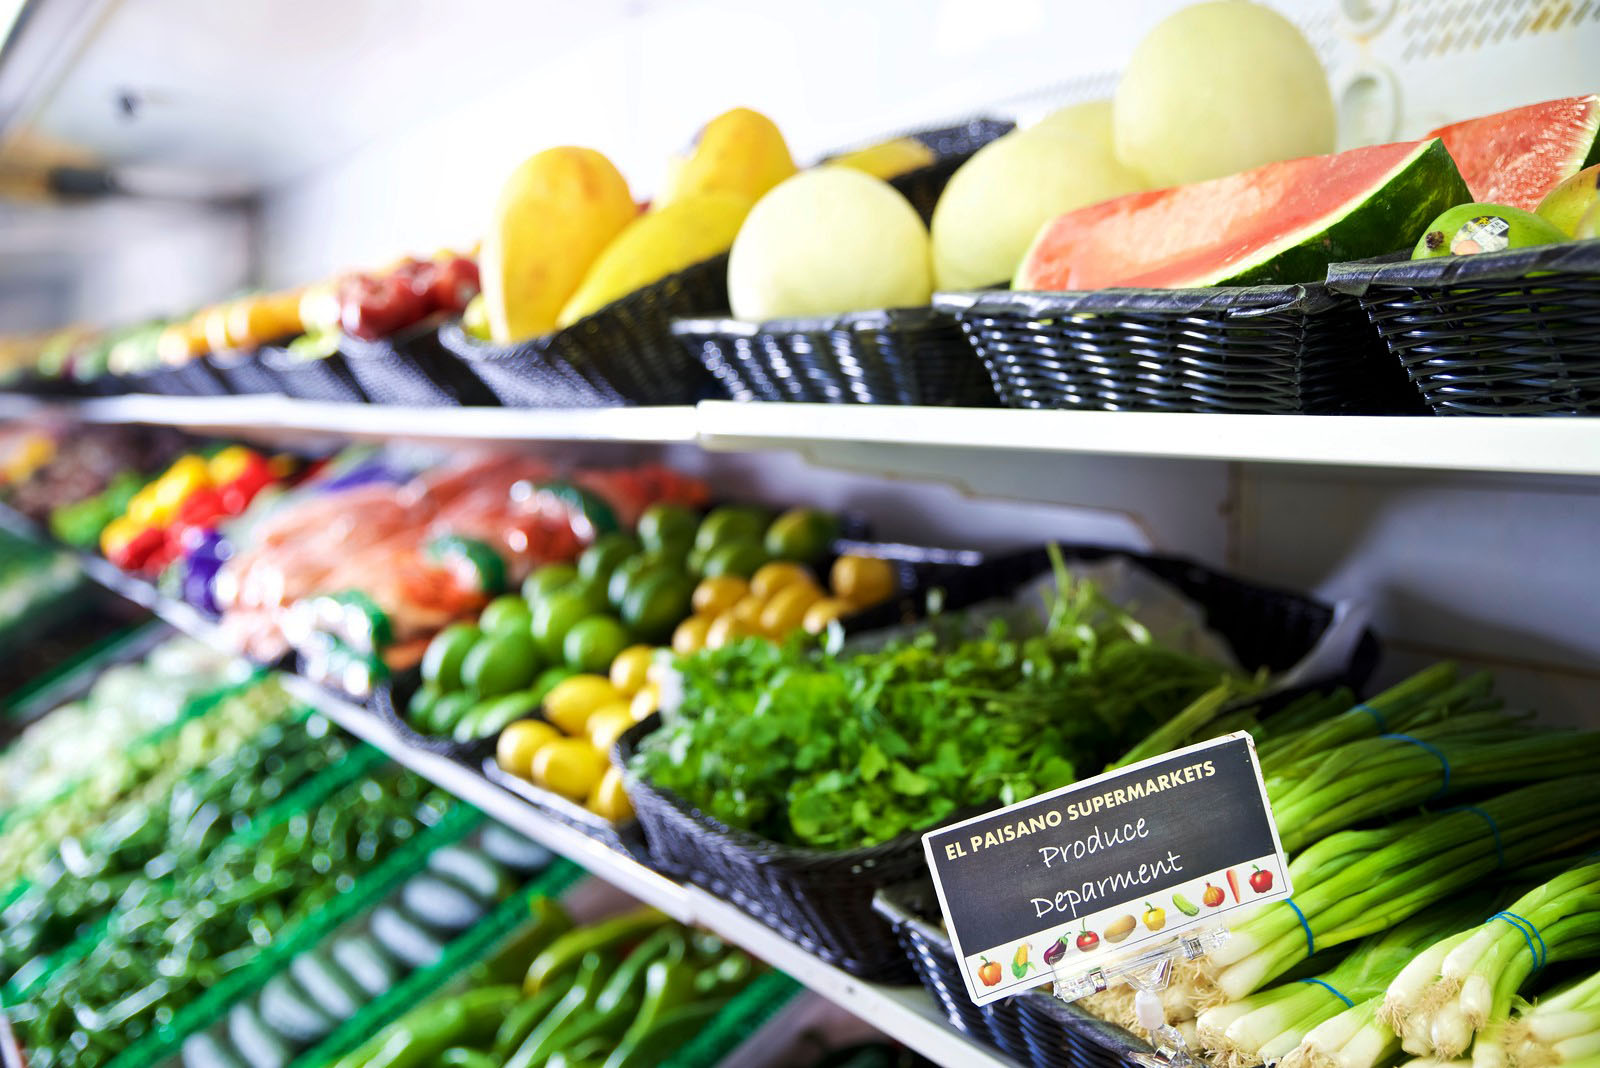 seccion verdura FINAL.jpg